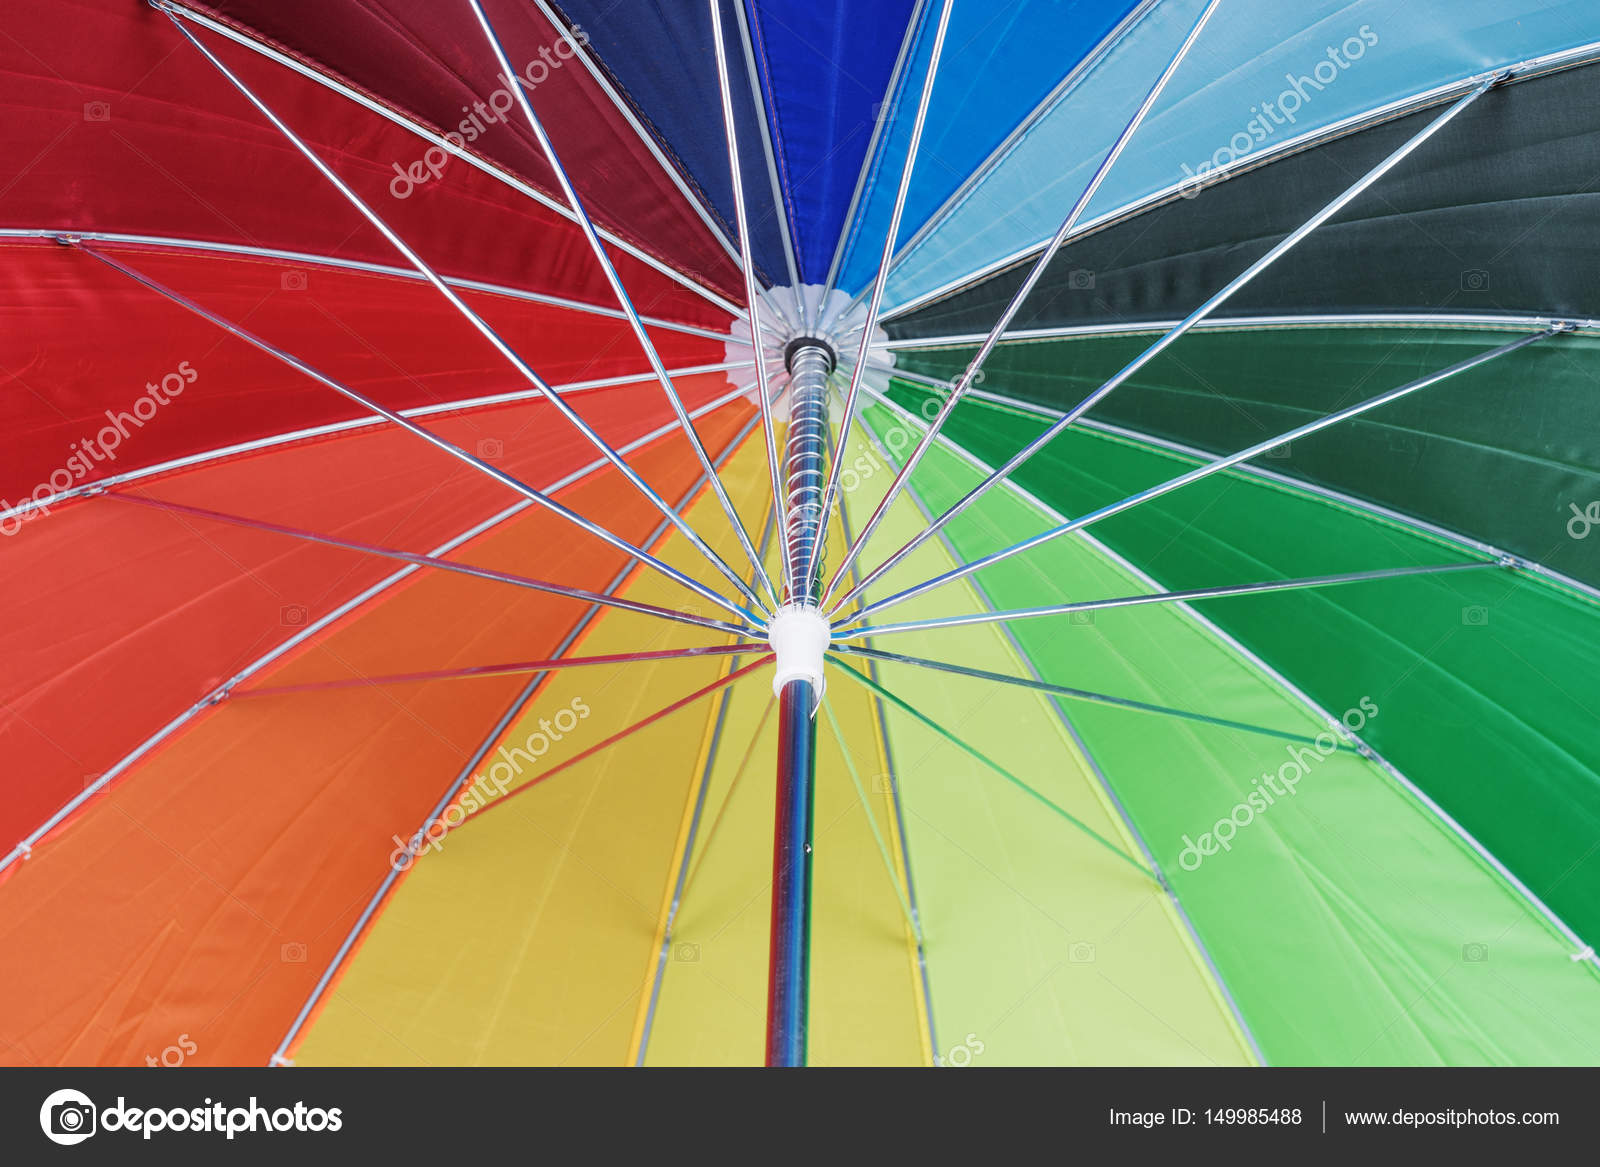 Texture of under colorful umbrella — Stock Photo © kelifamily #149985488